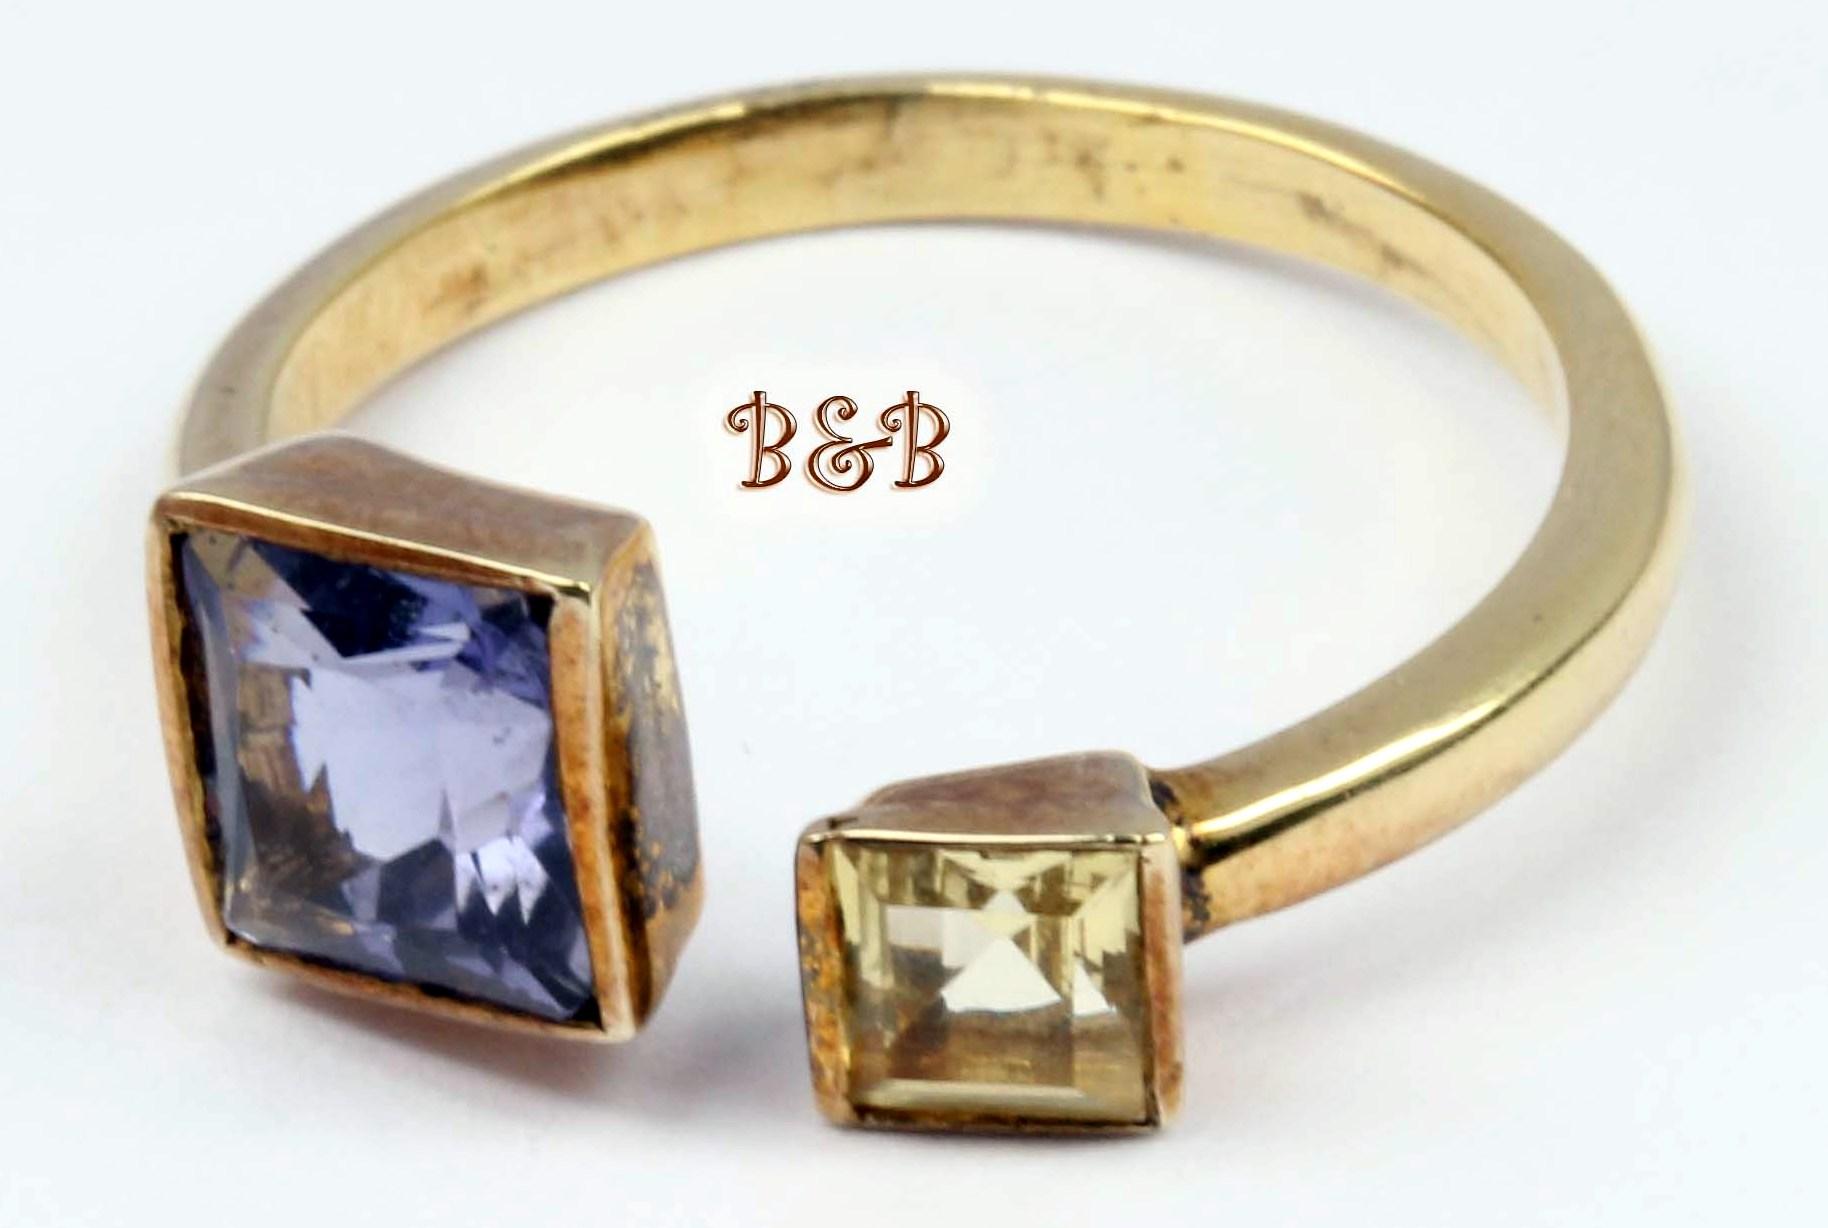 Silver ring_B&B_1645